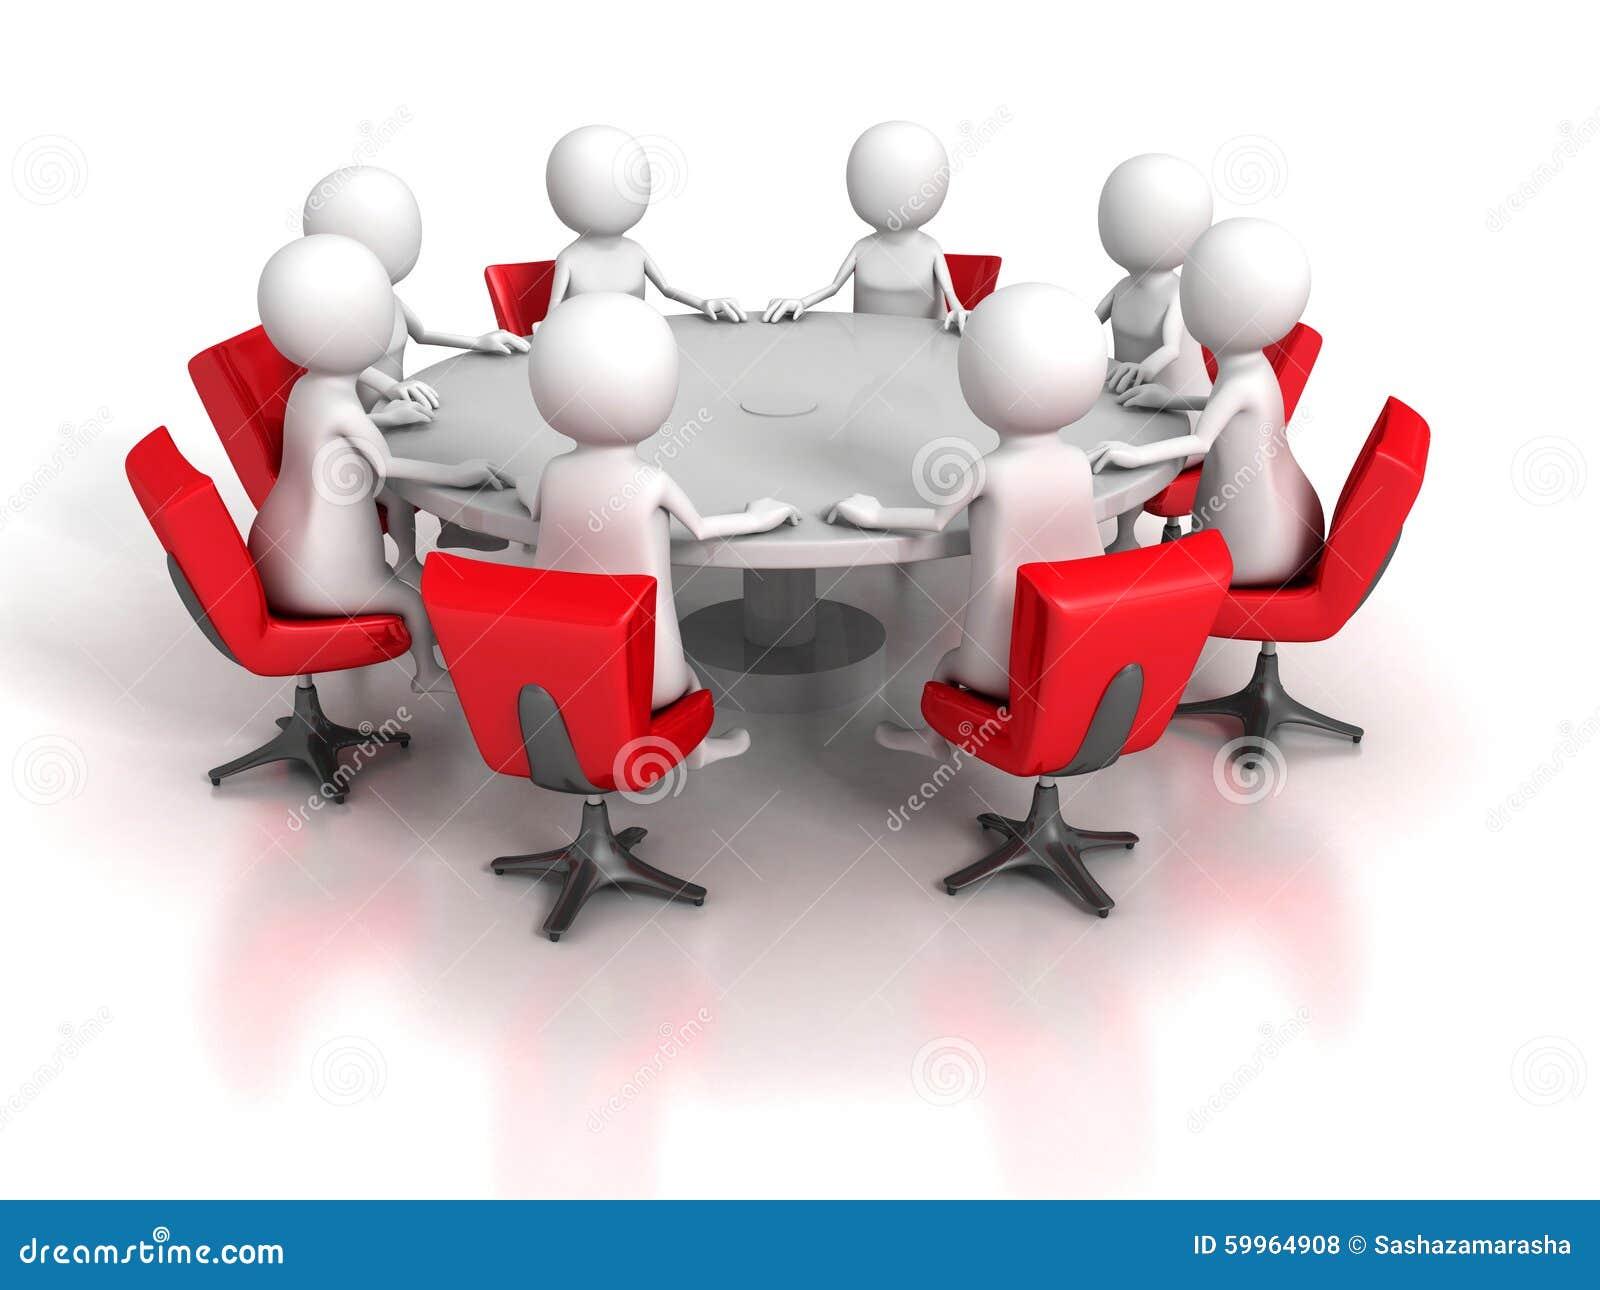 how to run a team meeting